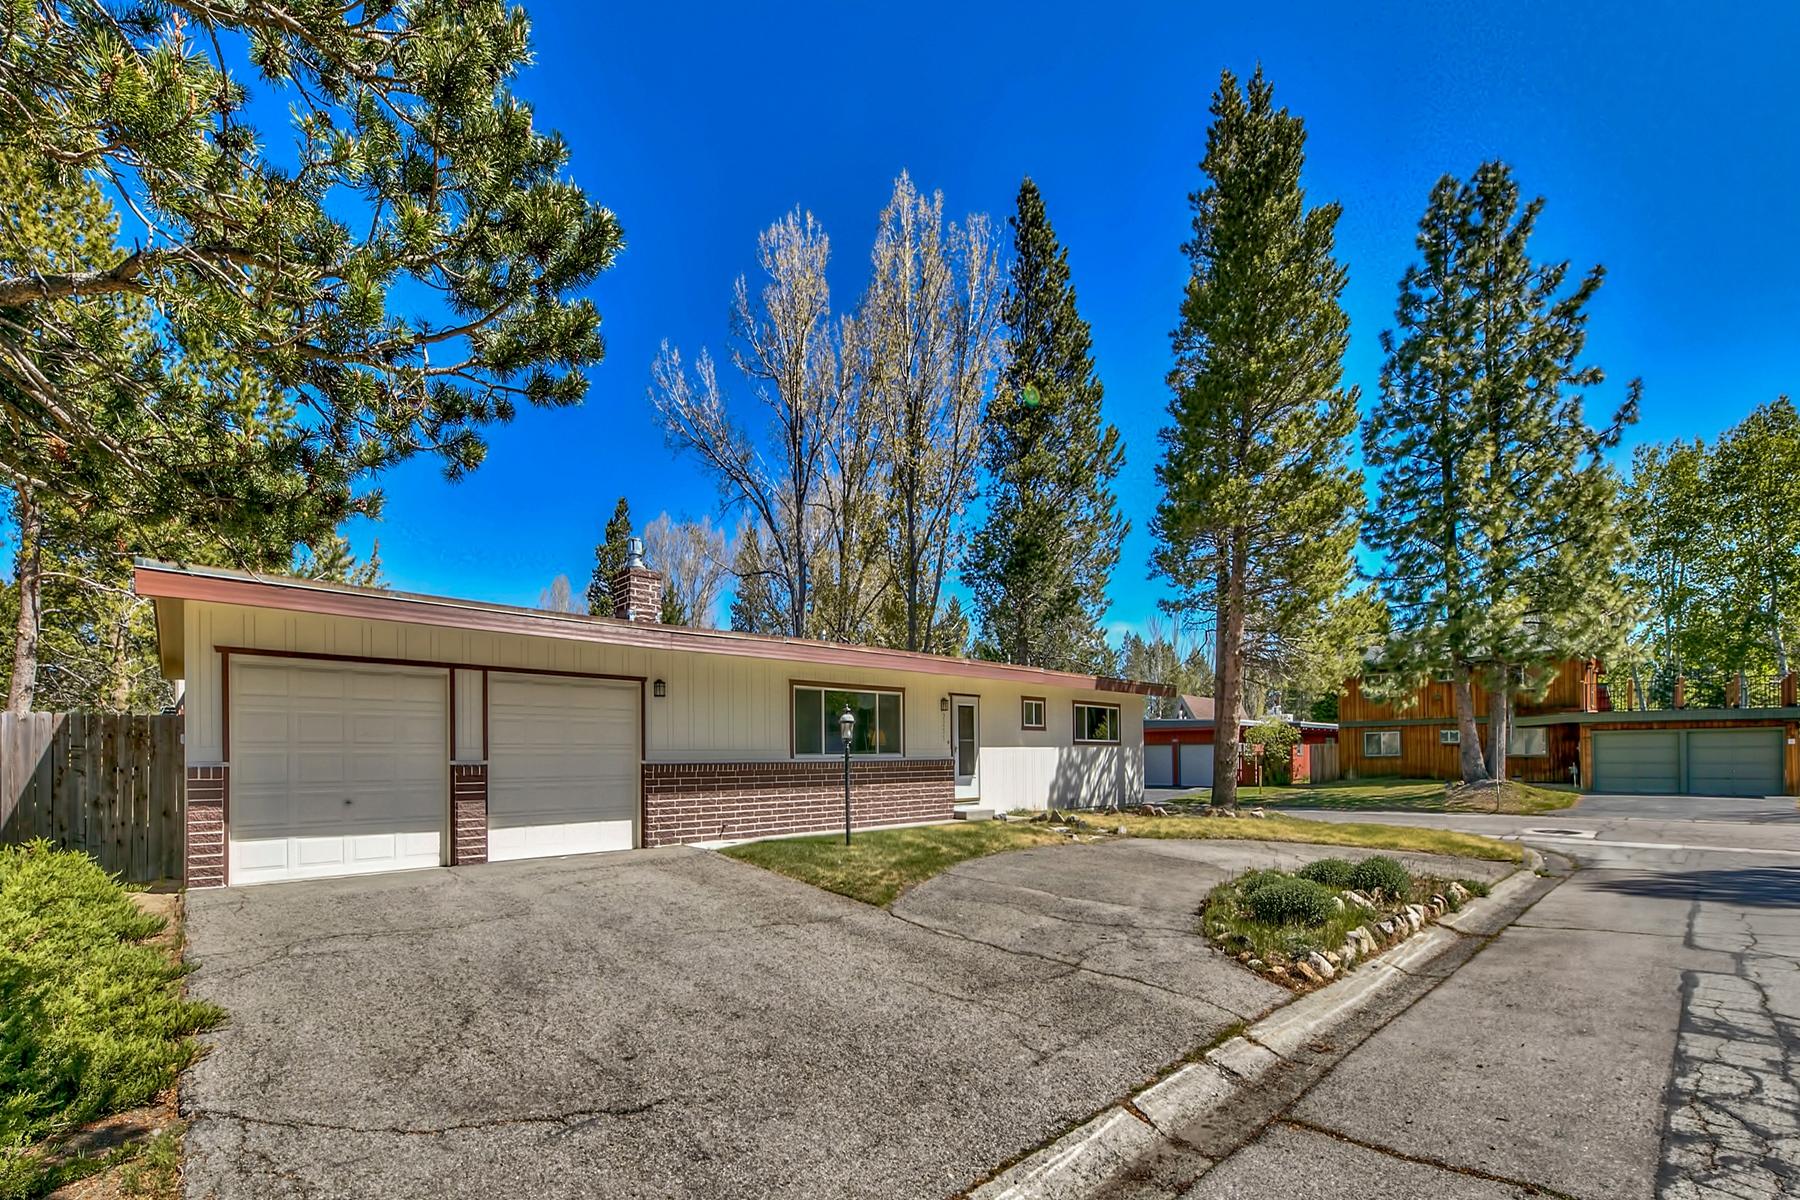 Property 为 销售 在 2255 Inverness Drive, South Lake Tahoe, CA 96150 2255 Inverness Drive 南太浩湖, 加利福尼亚州 96150 美国